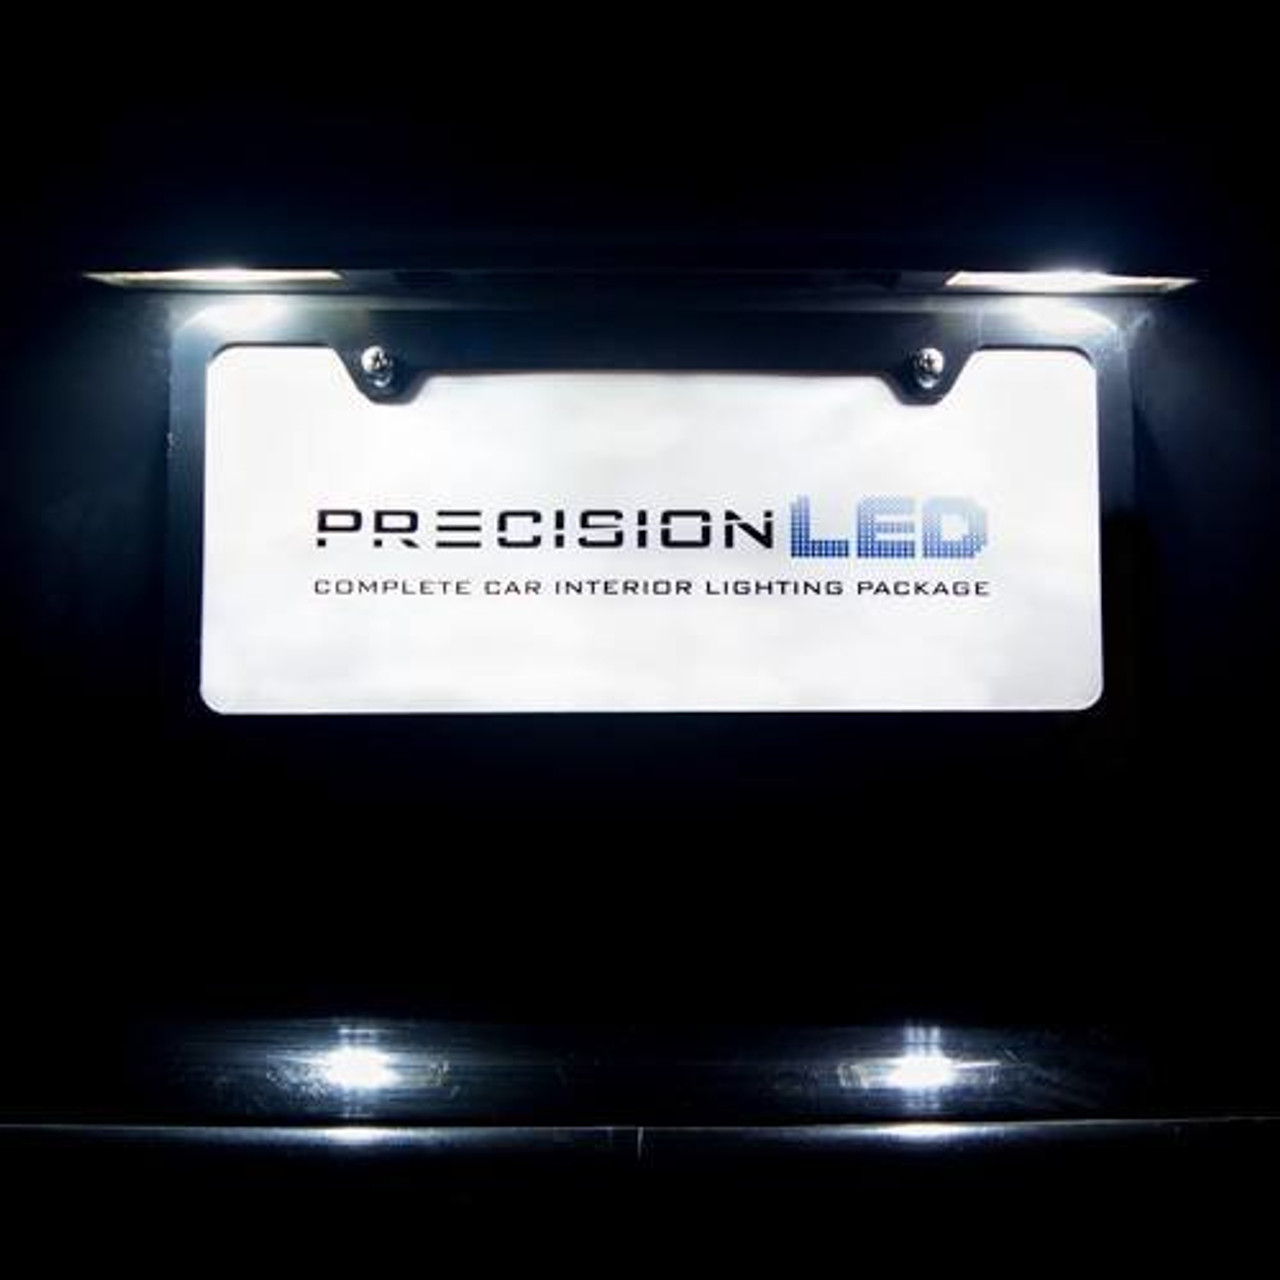 Infiniti G37 Convertible LED License Plate Lights (2009-Present)